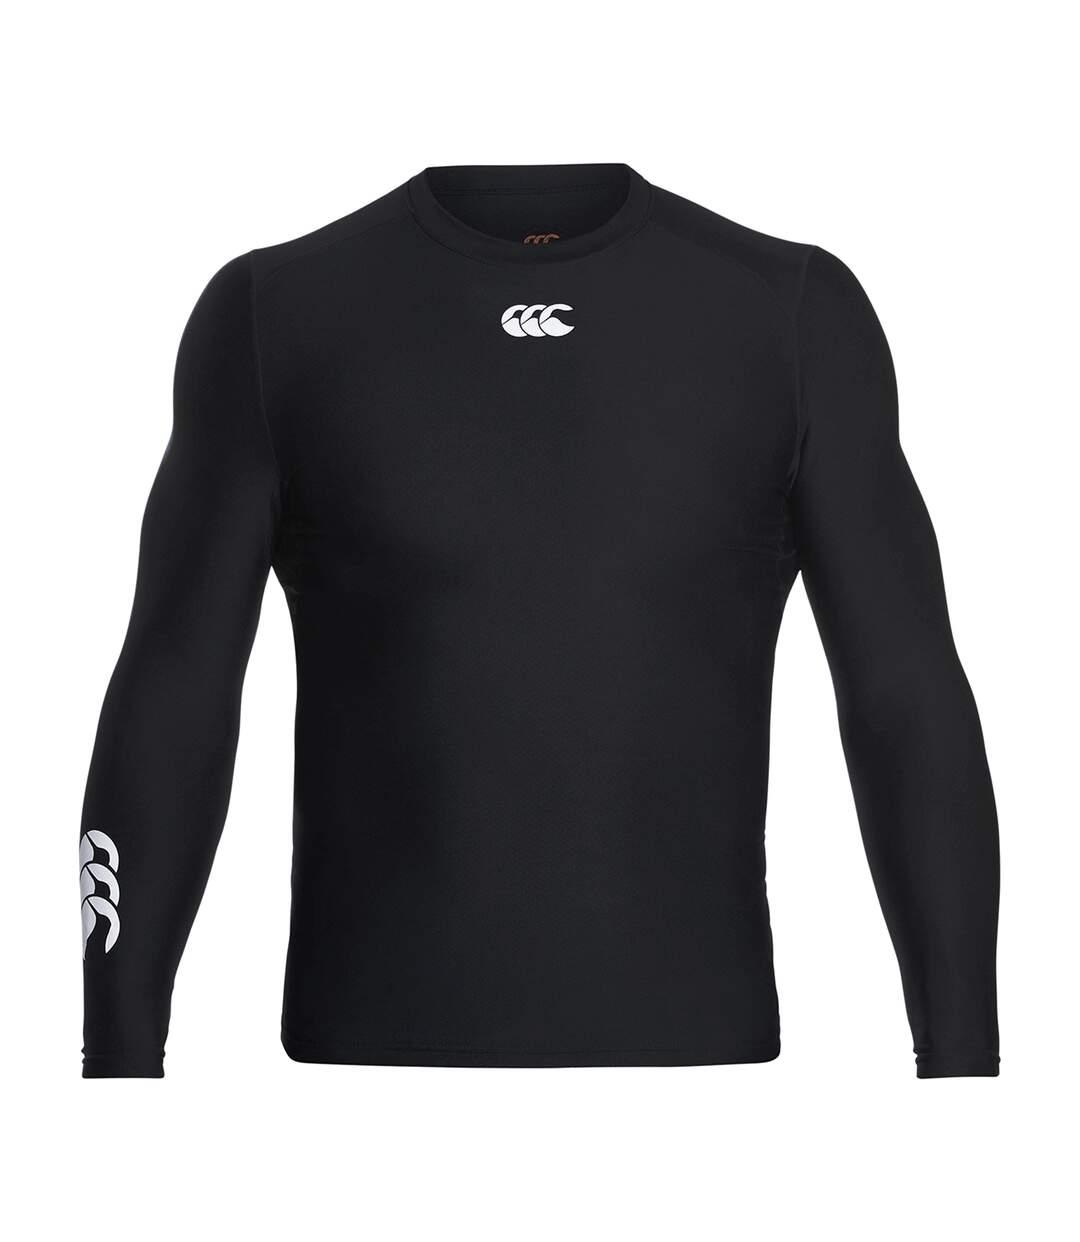 Canterbury Mens ThermoReg Long Sleeve Base Layer Top (Black) - UTPC2842